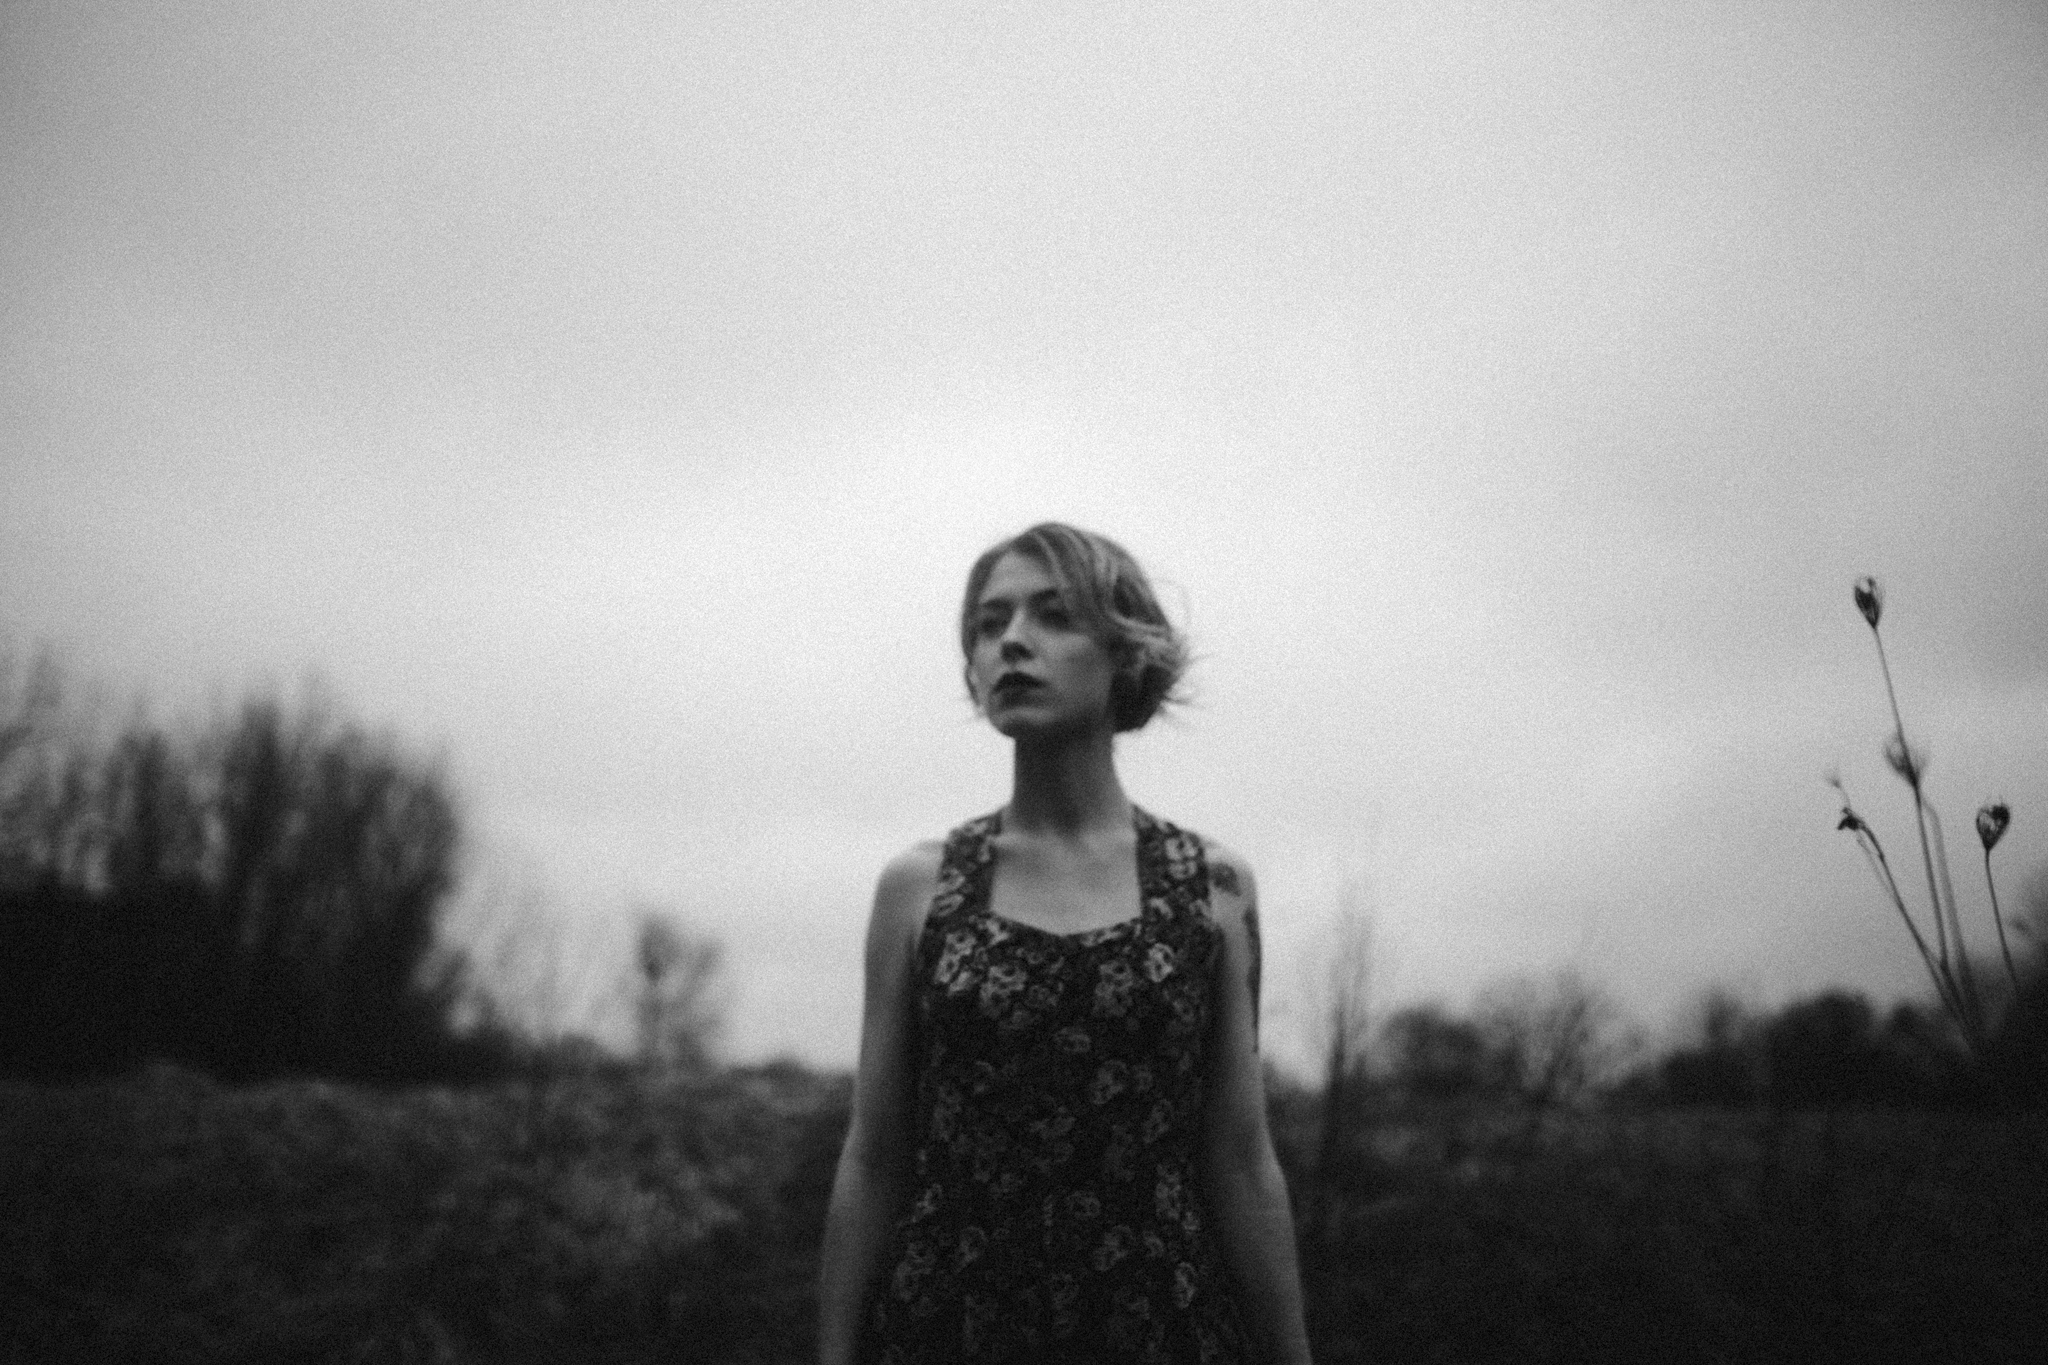 Jess-rioux-2017-138fb.jpg